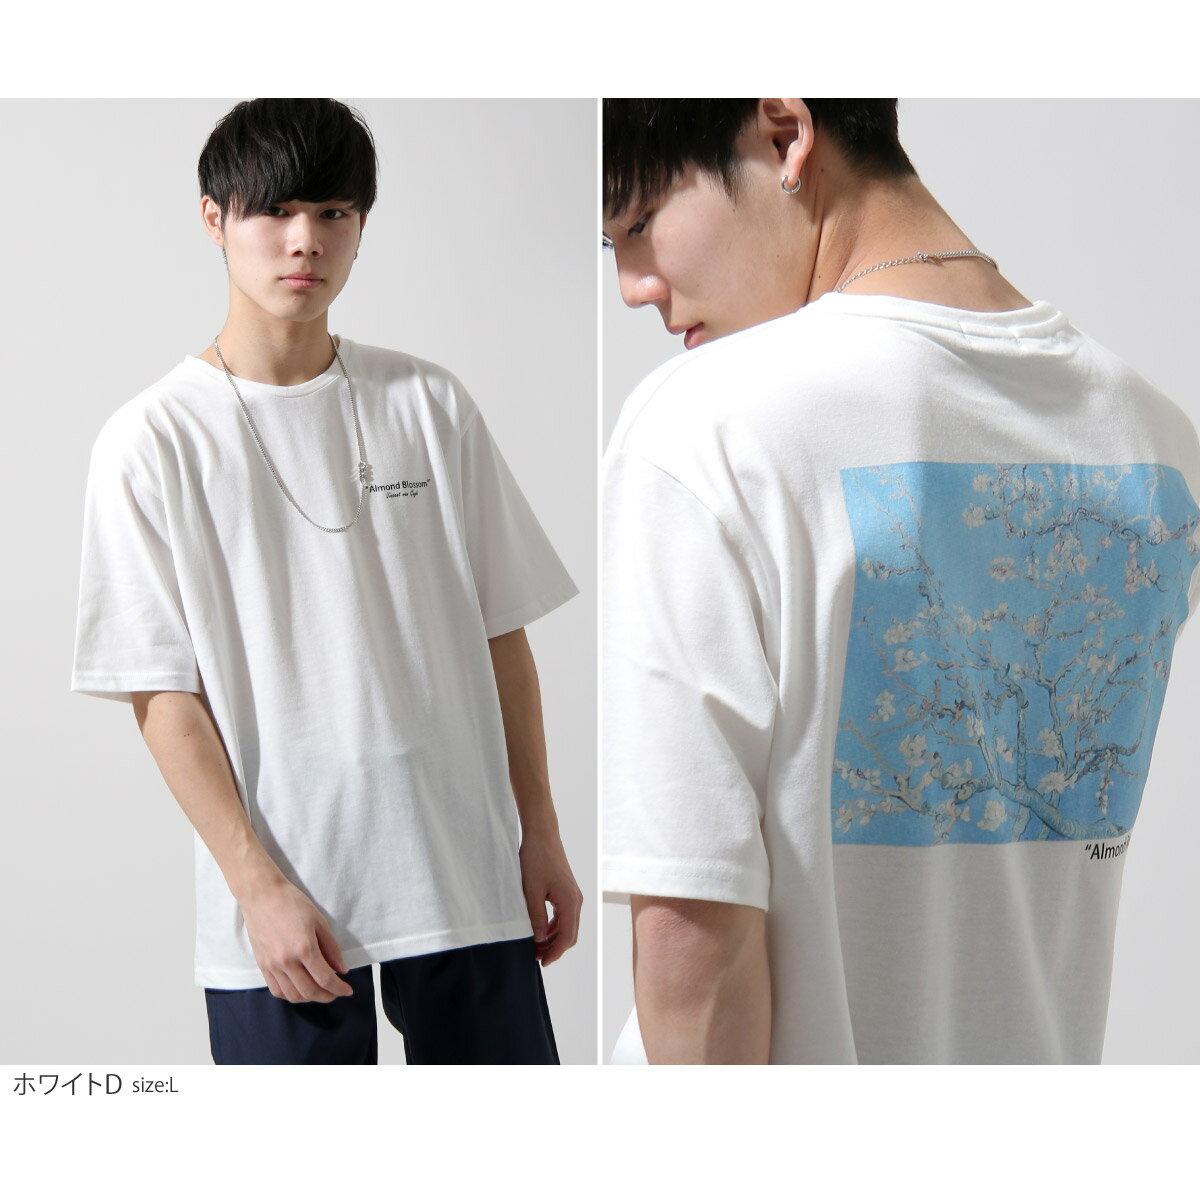 【ZIP】名畫印刷短袖TEE 背面印刷 1